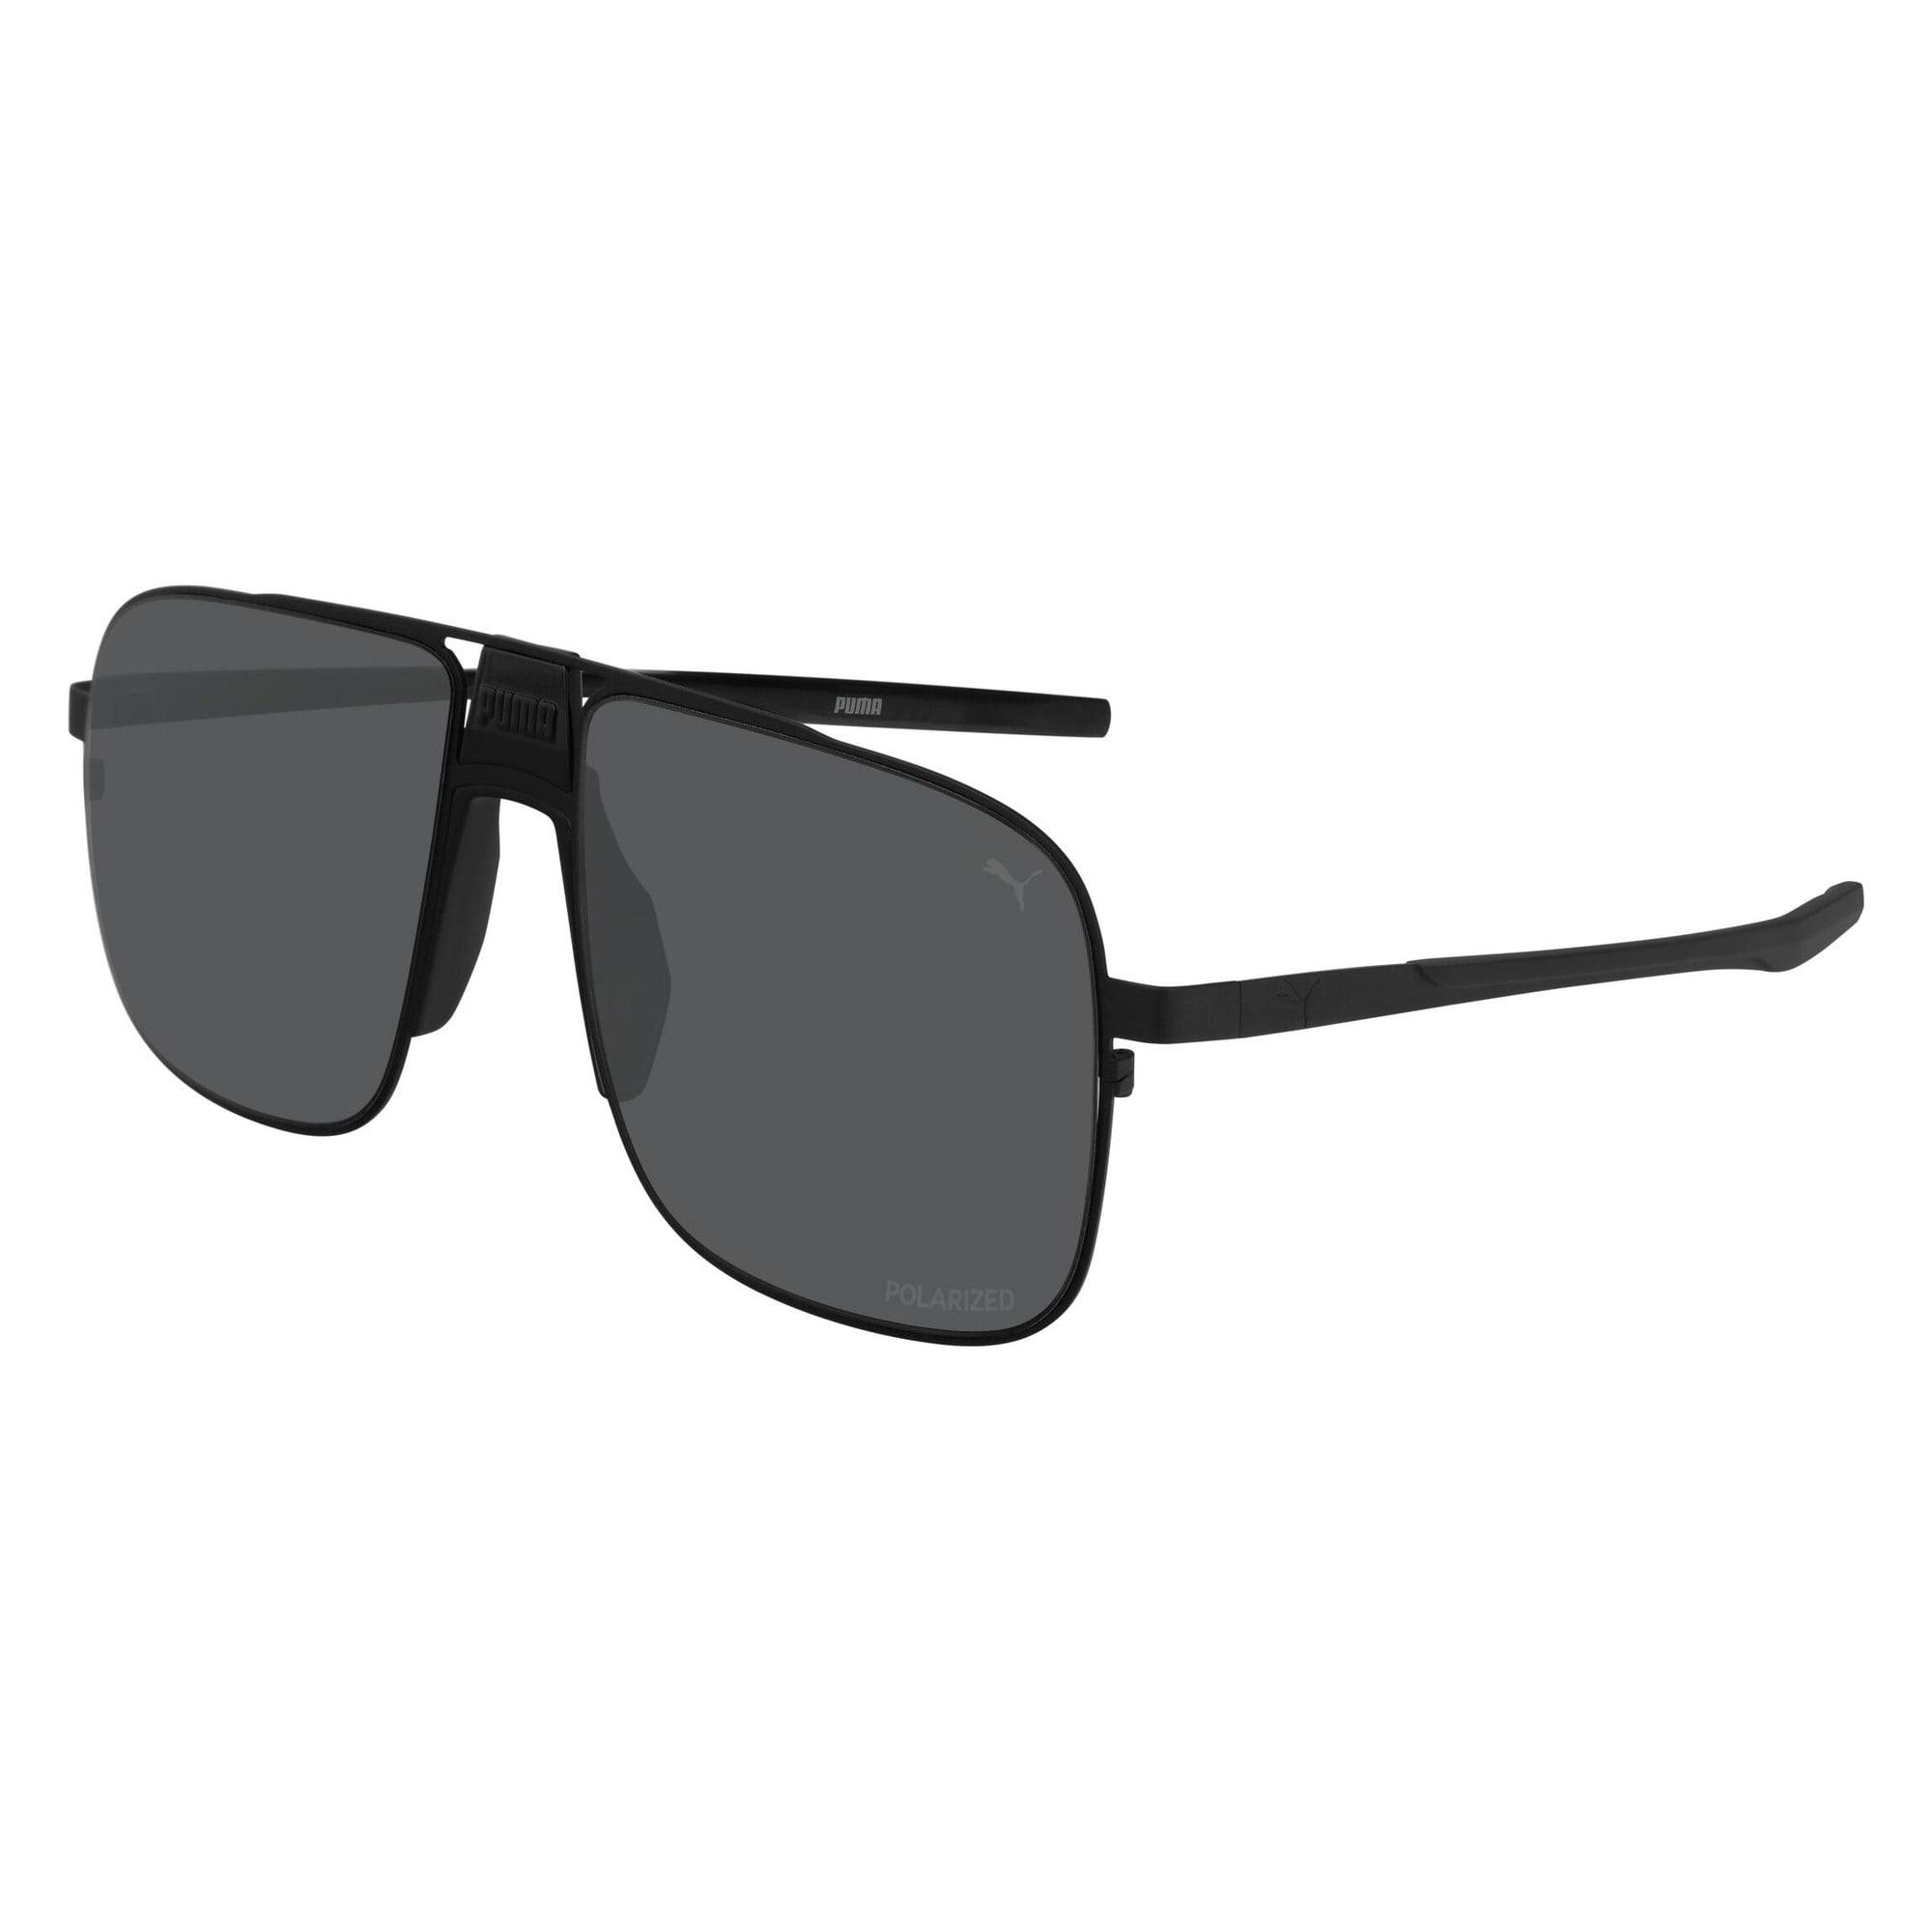 Thumbnail 1 of Lookout Sunglasses, RUTHENIUM-RUTHENIUM-SILVER, medium